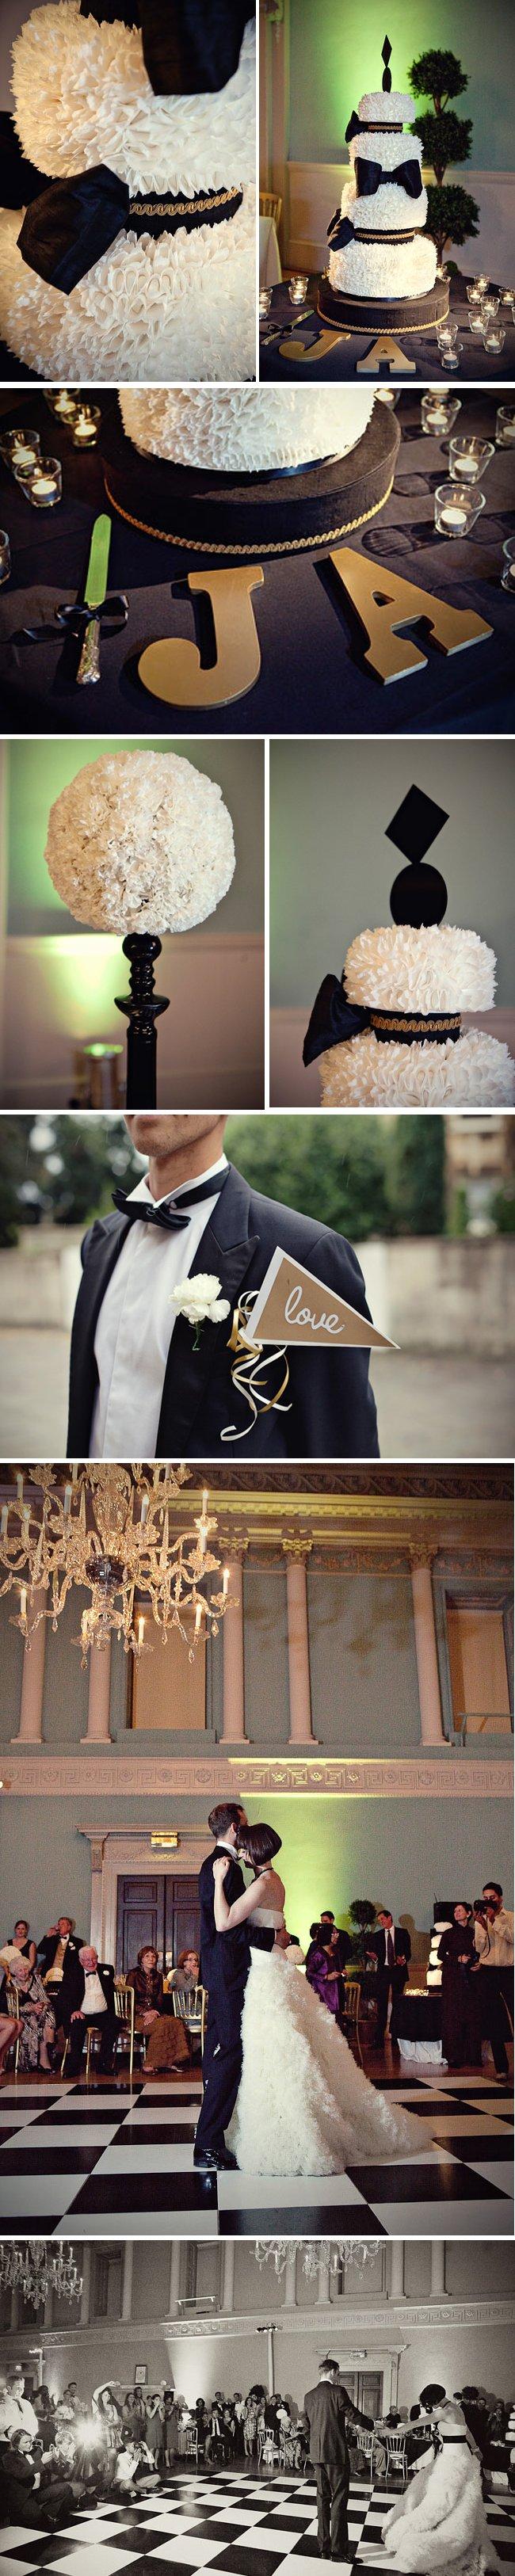 Elegant-black-white-wedding-flowers-reception-decor-vera-wang-bridal-gown.full